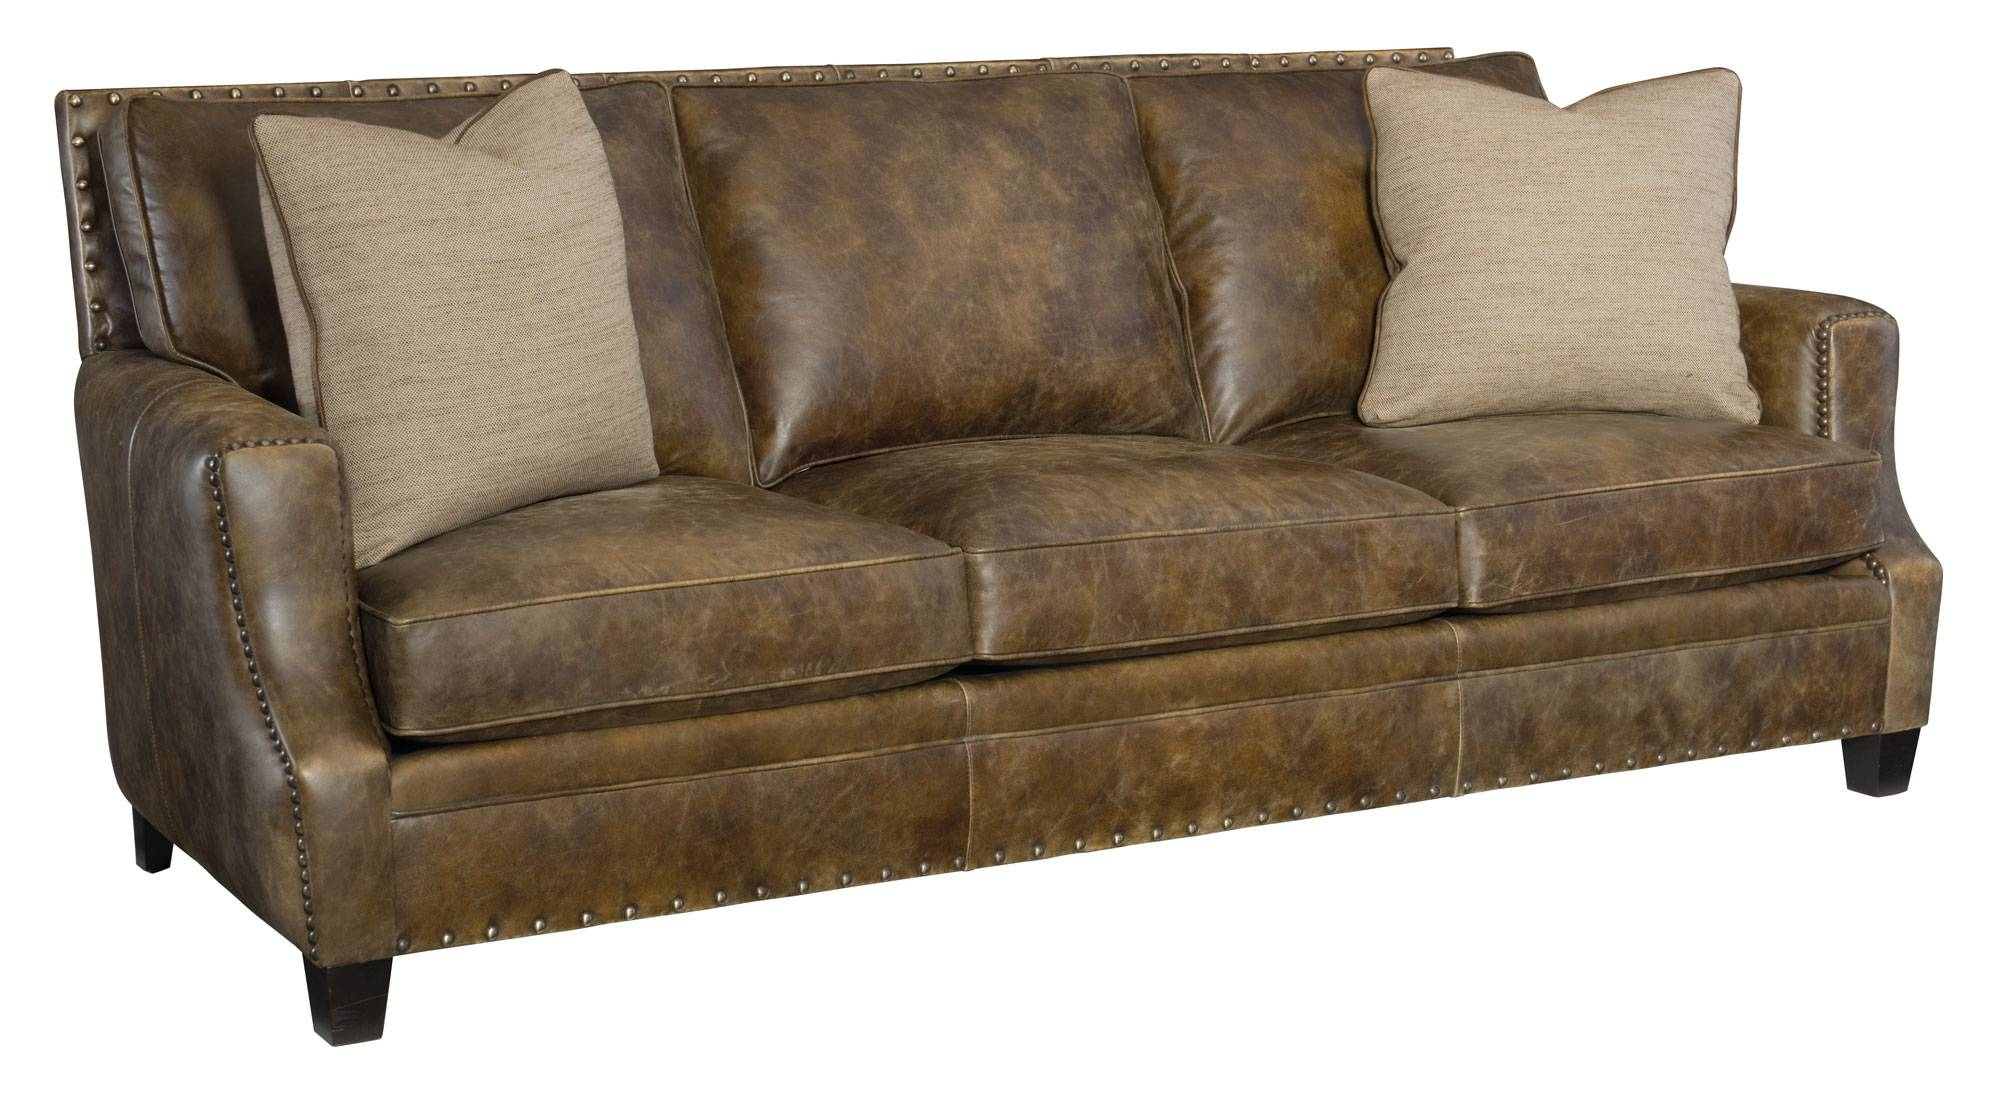 leather sofa craigslist natural milan kingston 3 seat set 30 ideas of